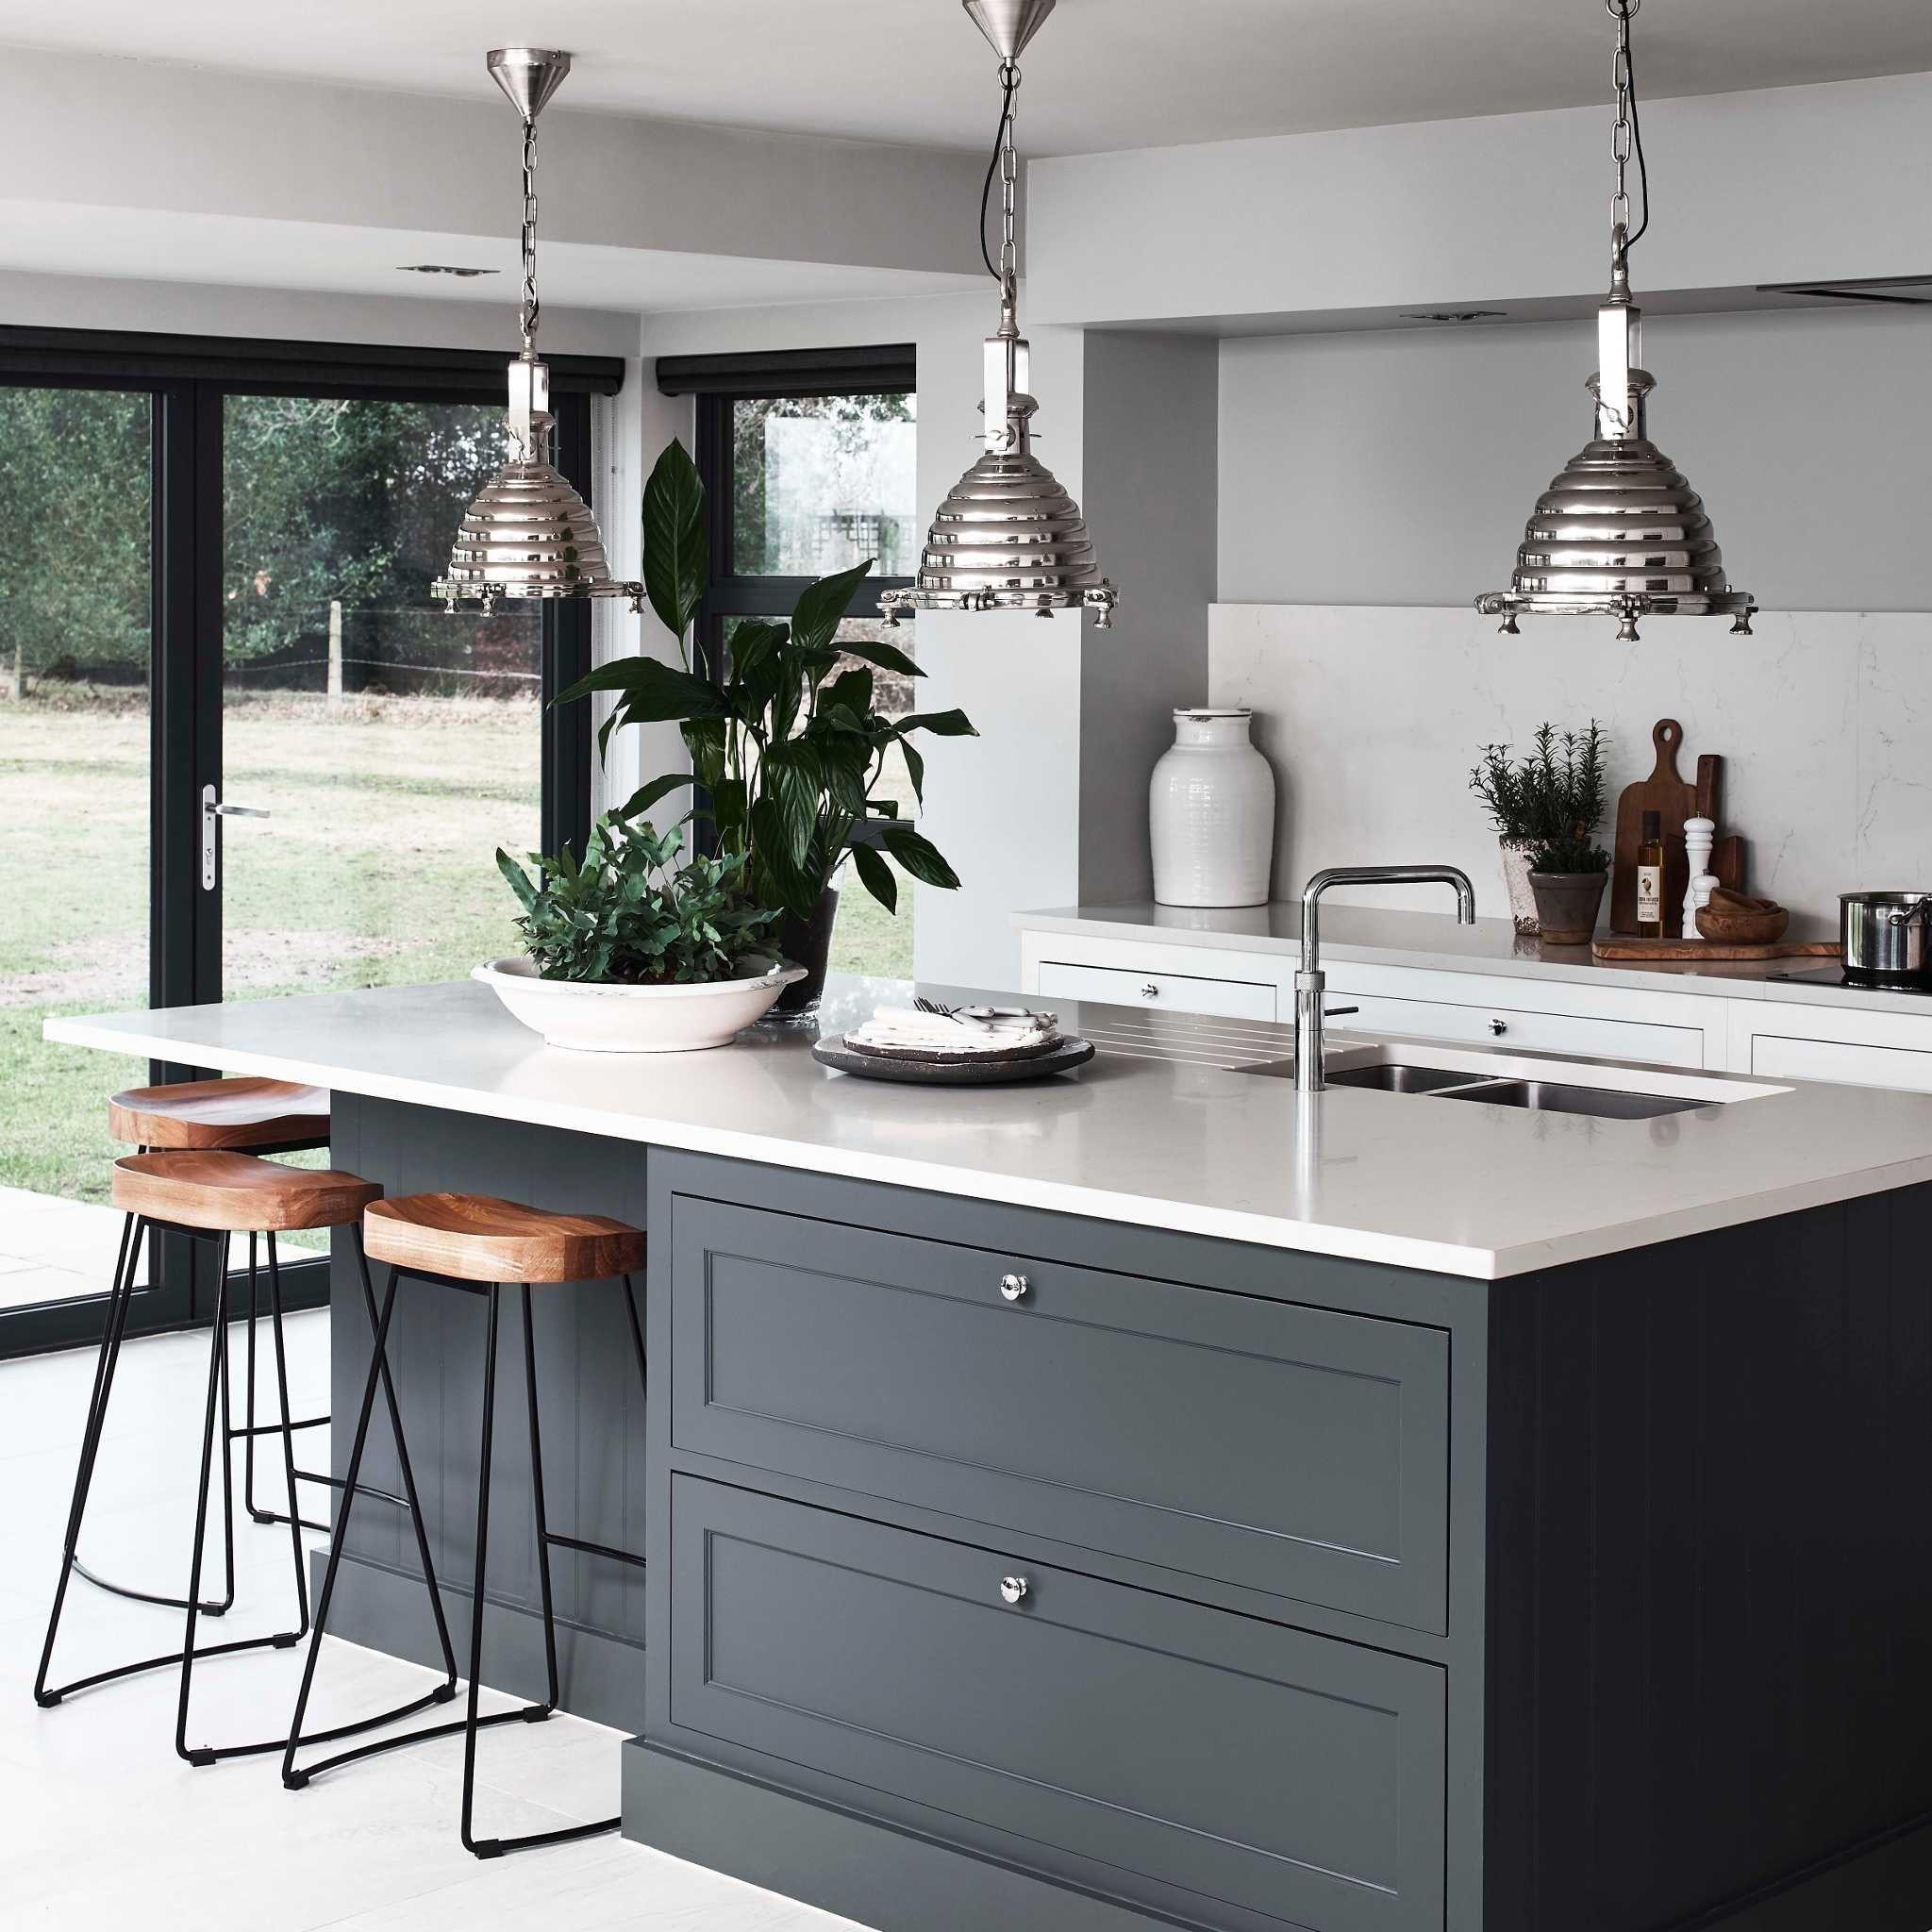 Kitchen Ideas With Island Kitchen Island With Seating And Sink Kitchen Island Design Kitchen Island With Seating Kitchen Plans